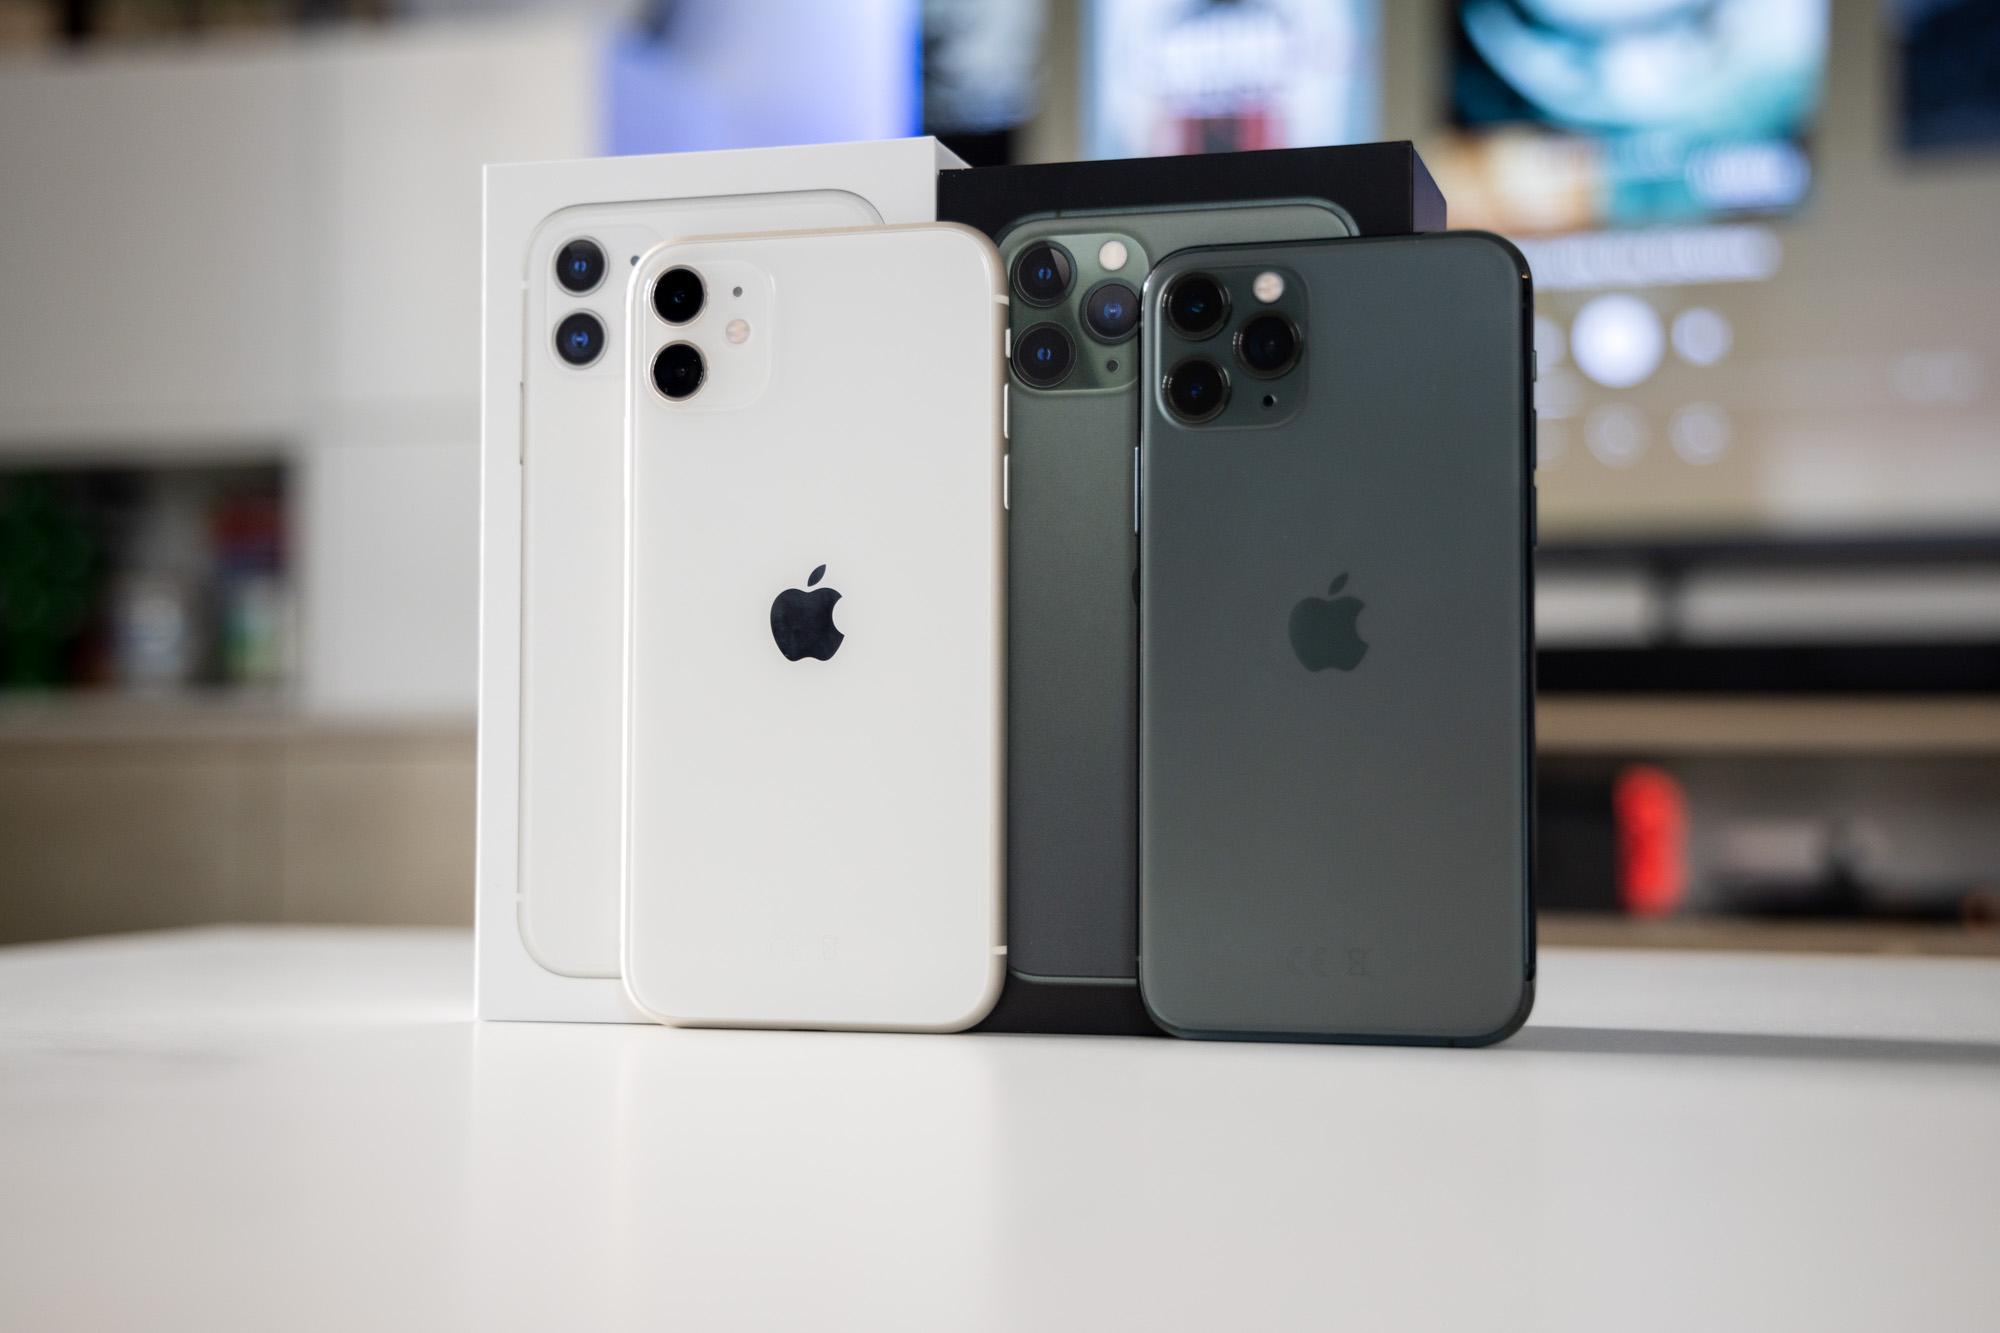 iPhone 11 i iPhone 11 Pro Max